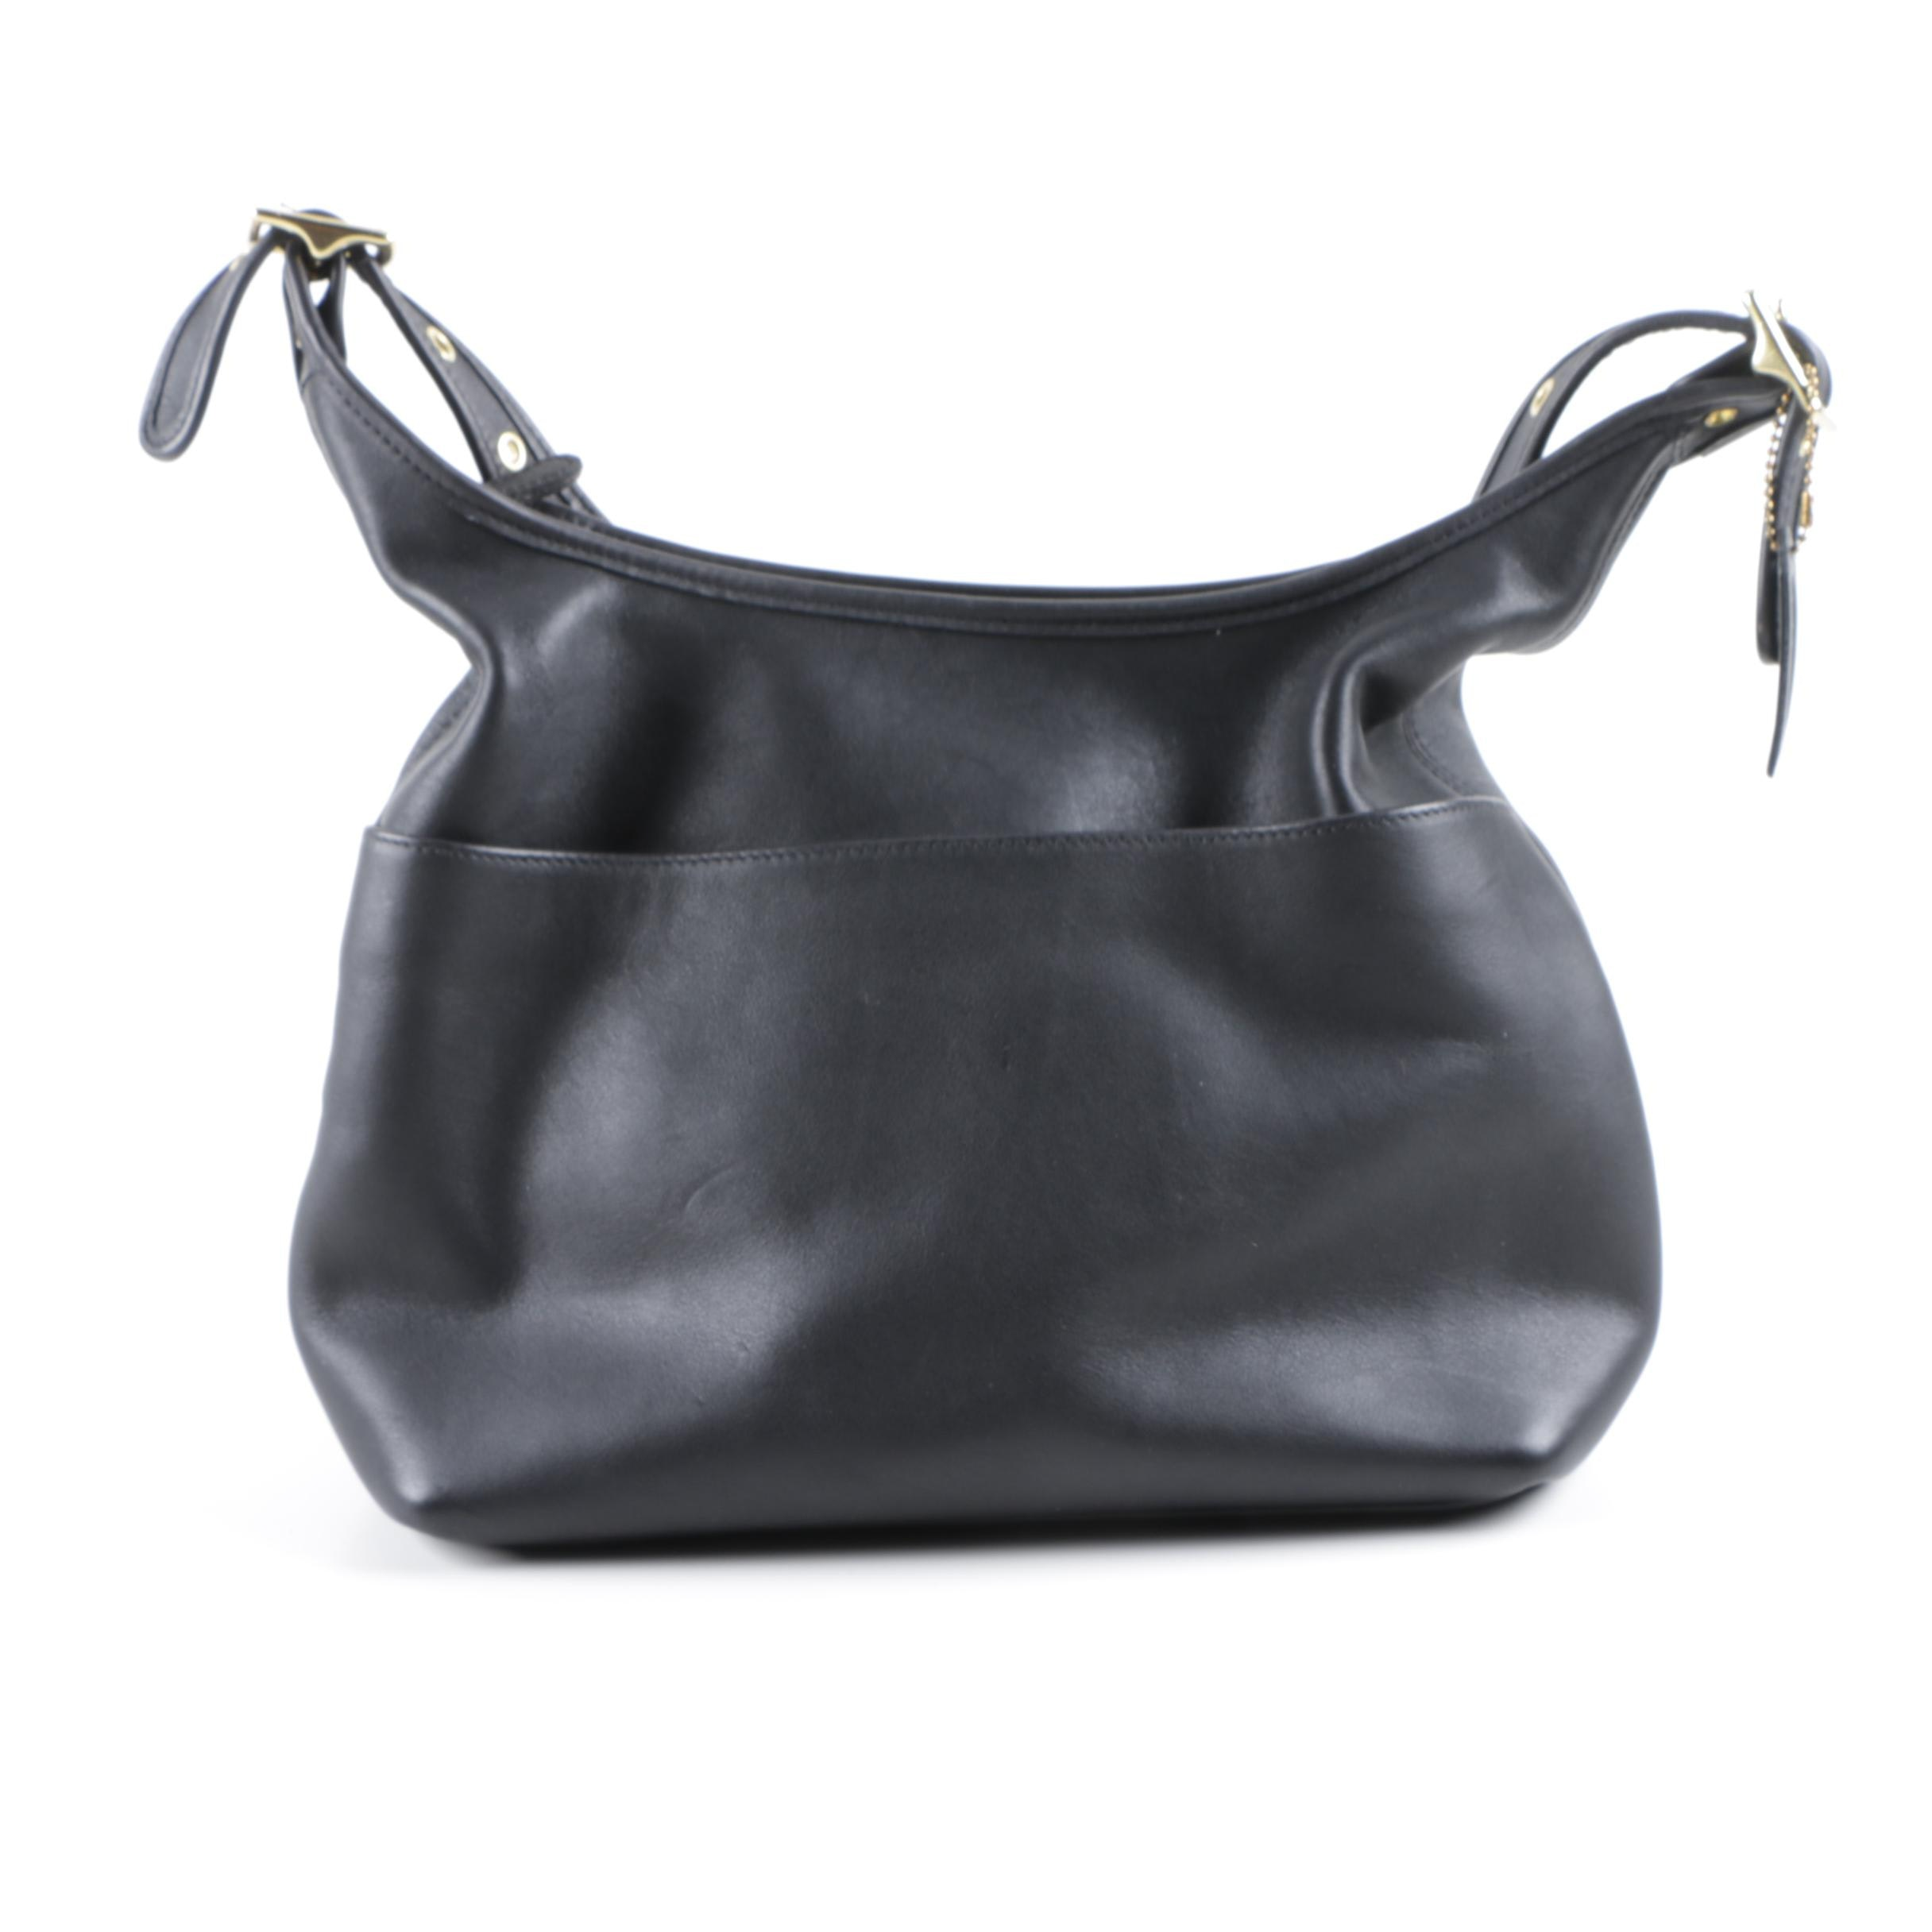 2001 Coach Legacy Black Leather Hobo Bag